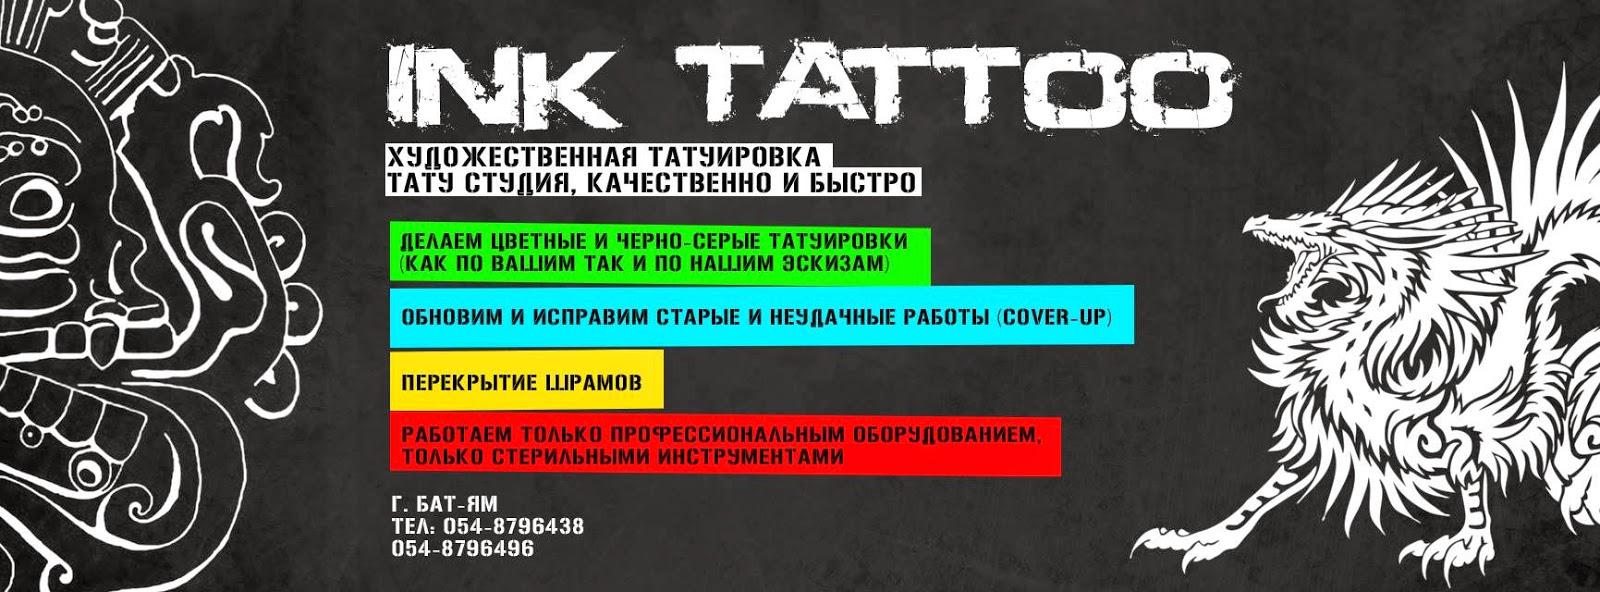 тату цитаты на английском - Фразы на английском для татуировки Уникальная